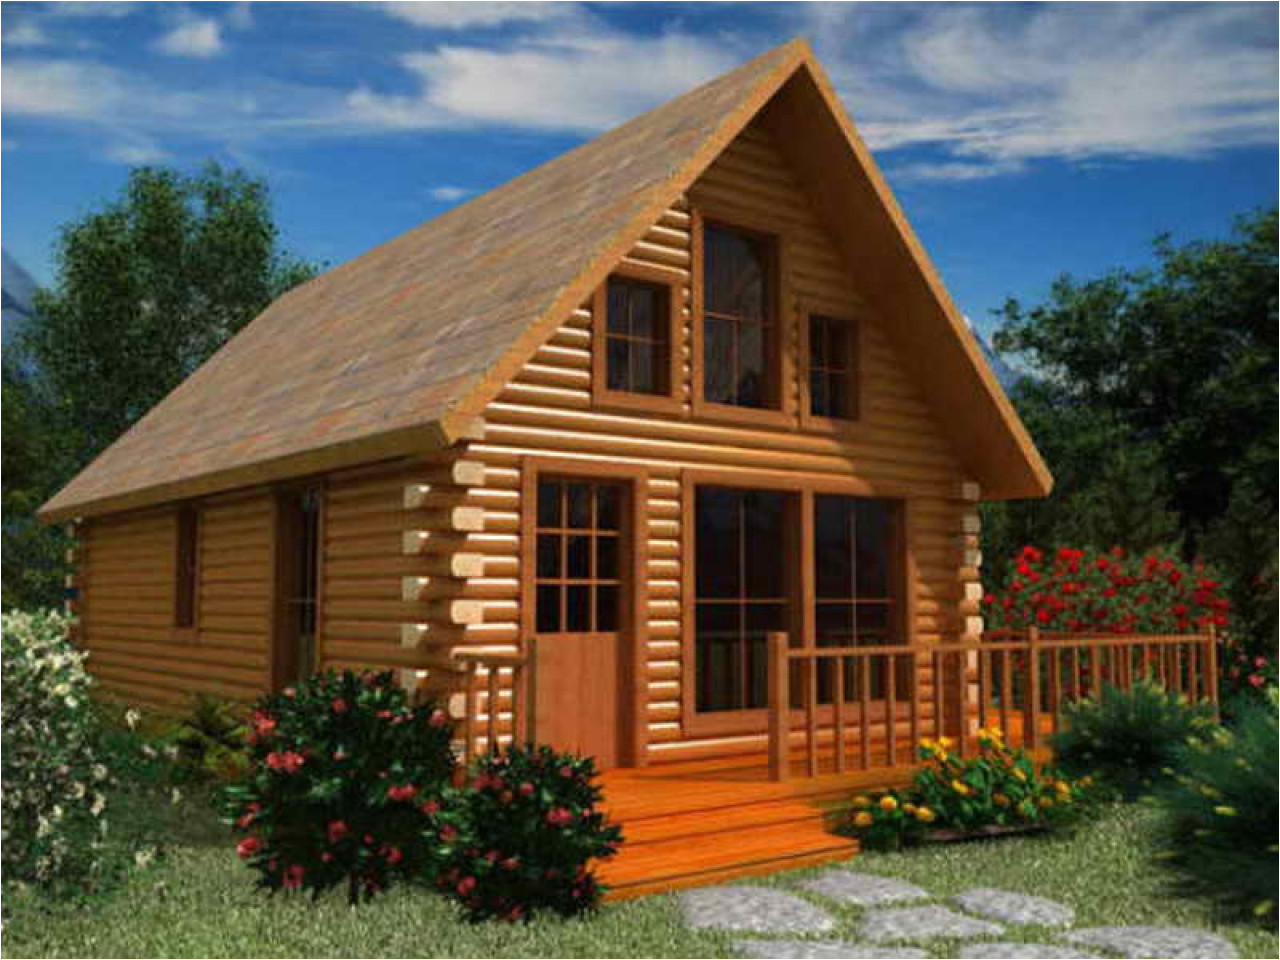 6c8a327f2e5eb875 planning amp ideas log cabin floor plans project concrete house wedding planning ideas